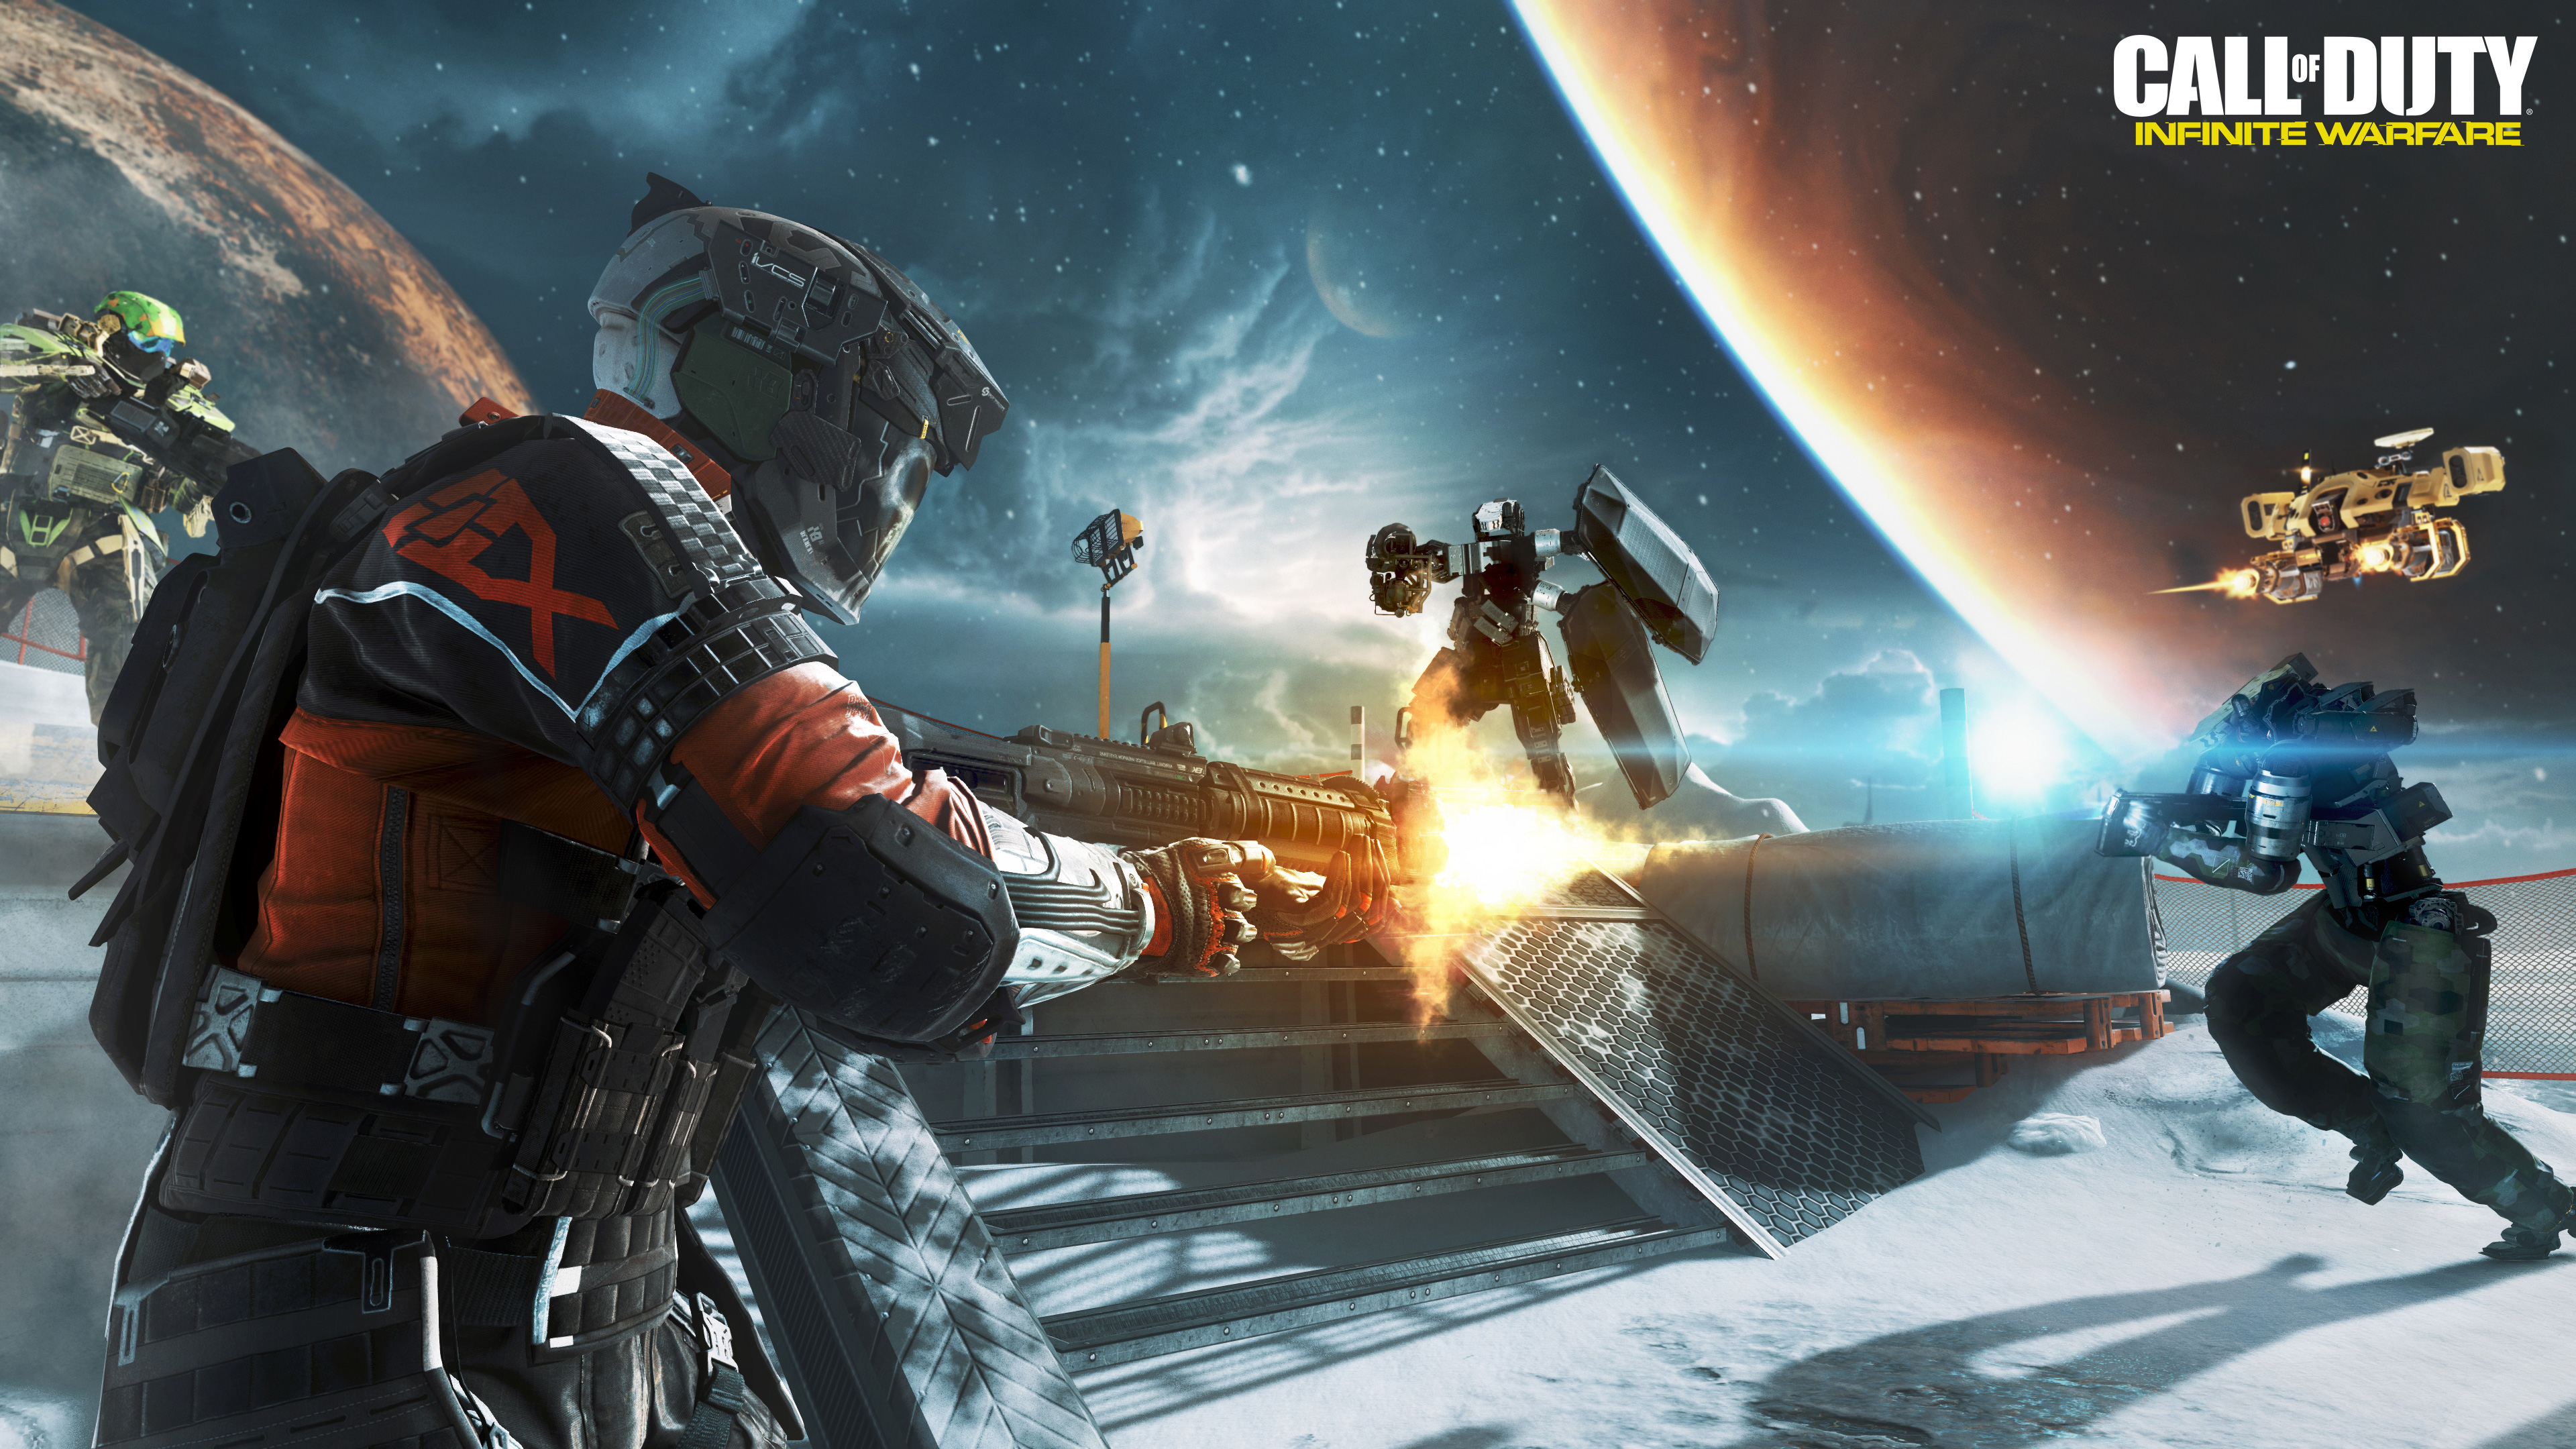 Cod Infinite Warfare Wallpaper: 20 HD Call Of Duty Infinite Warfare Wallpapers